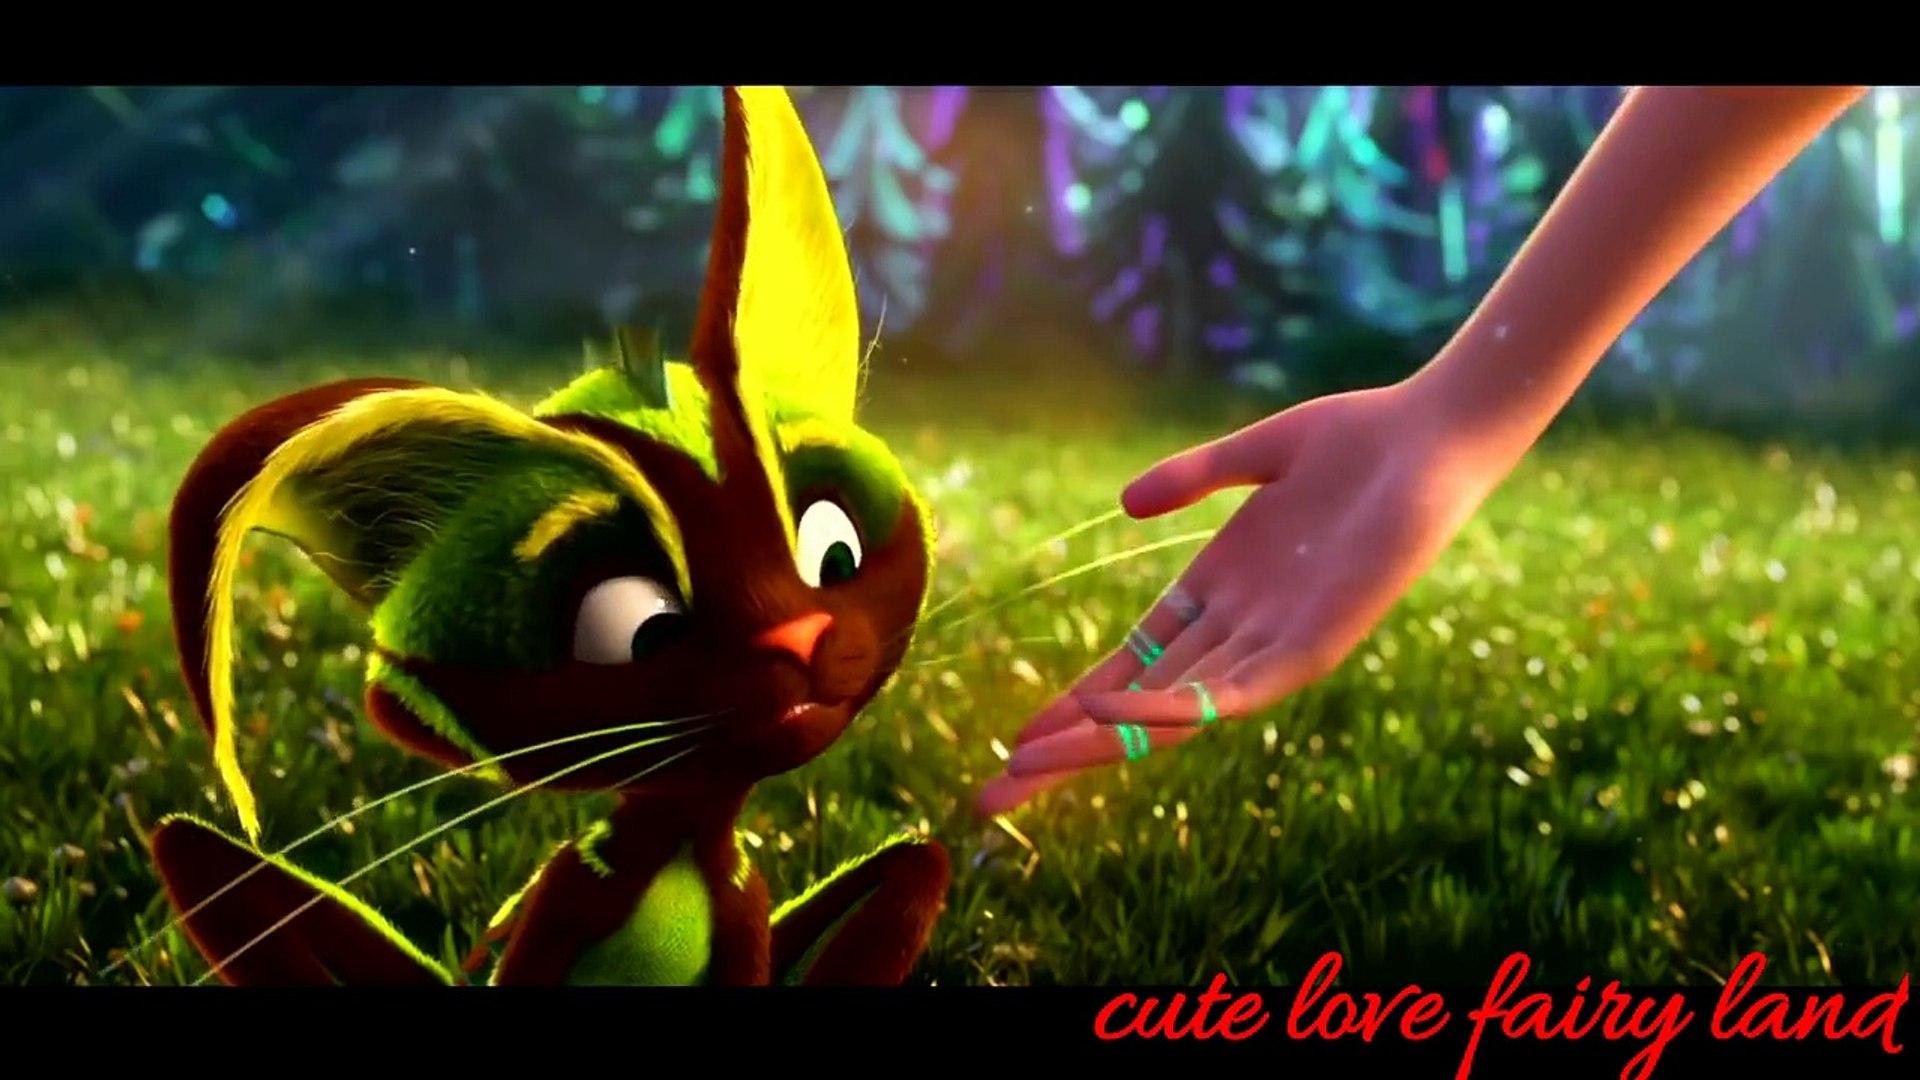 Animated Love Song Whatsapp Status Video 2018 Cute Love Fairy Land